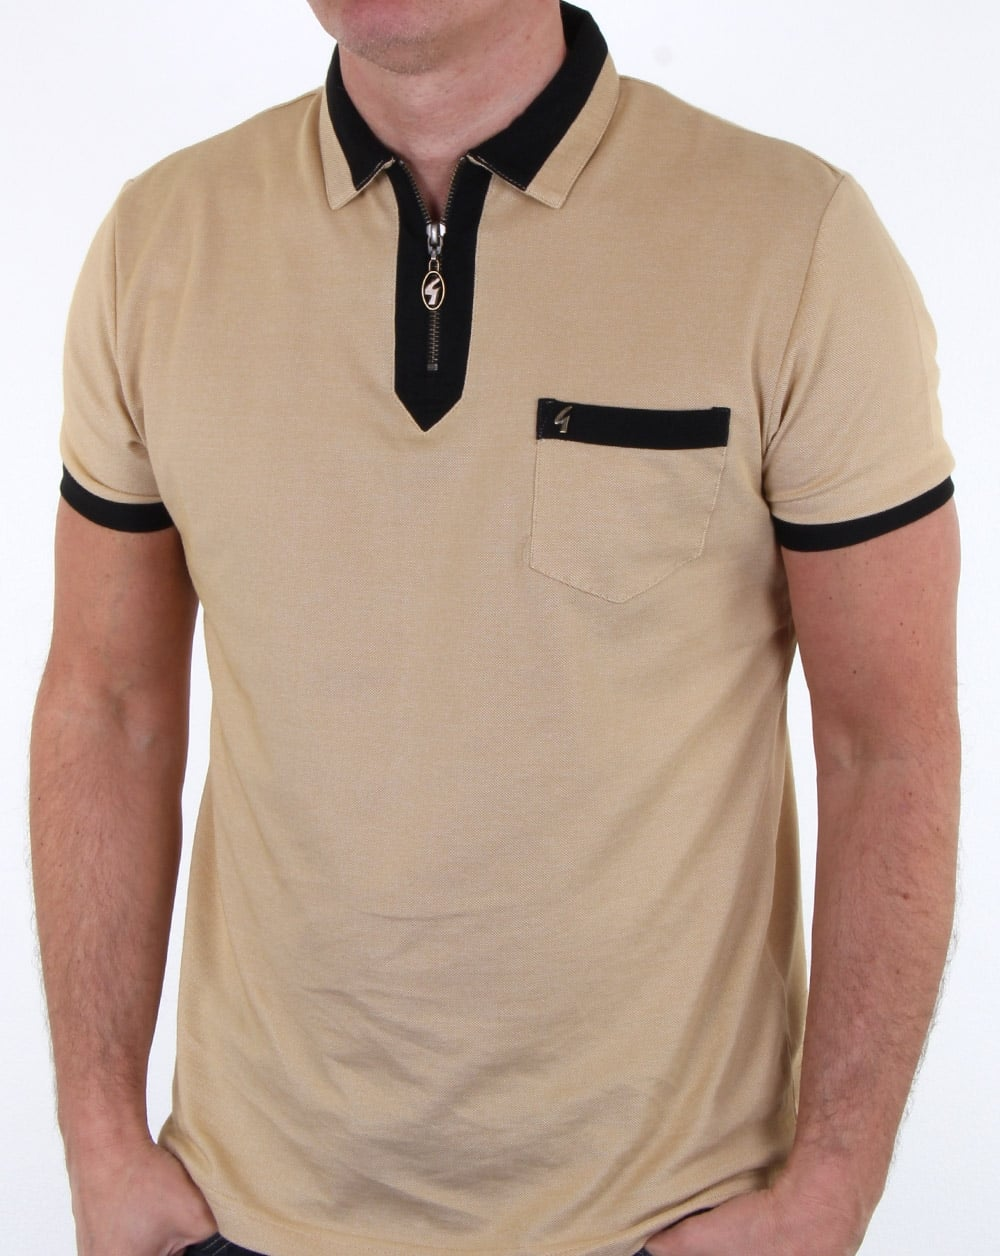 Gabicci Vintage Pirro polo shirt